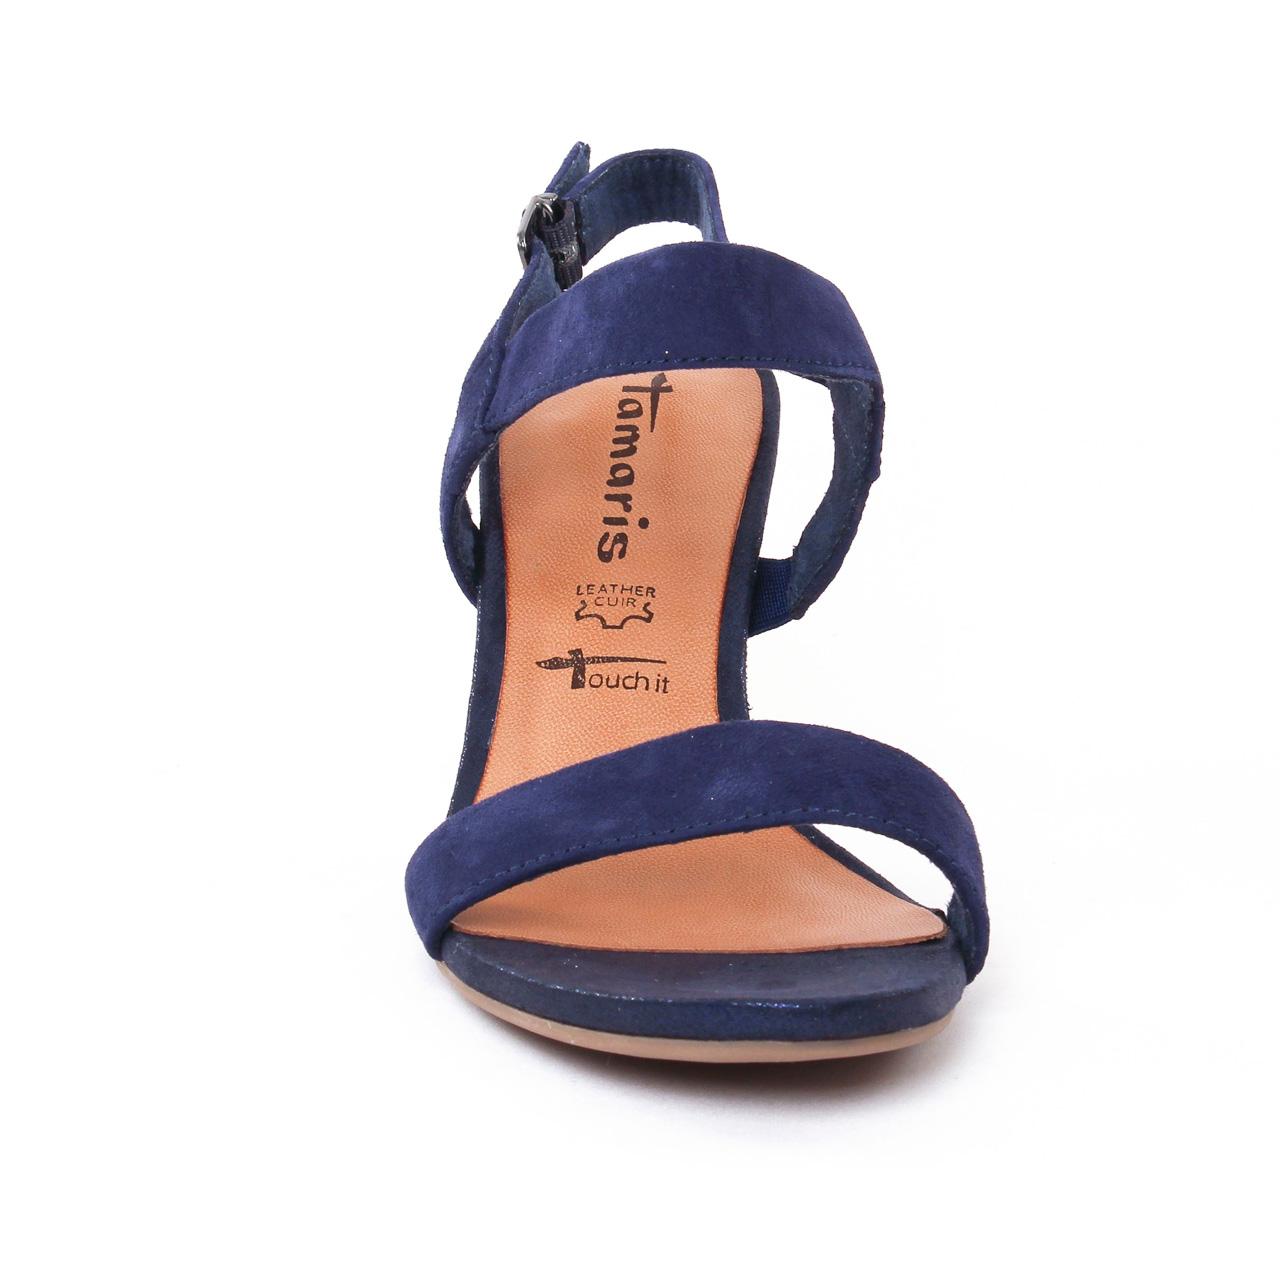 grand choix de e19c3 e36b1 Tamaris 28321 Blue | nu-pied talon hauts bleu marine ...